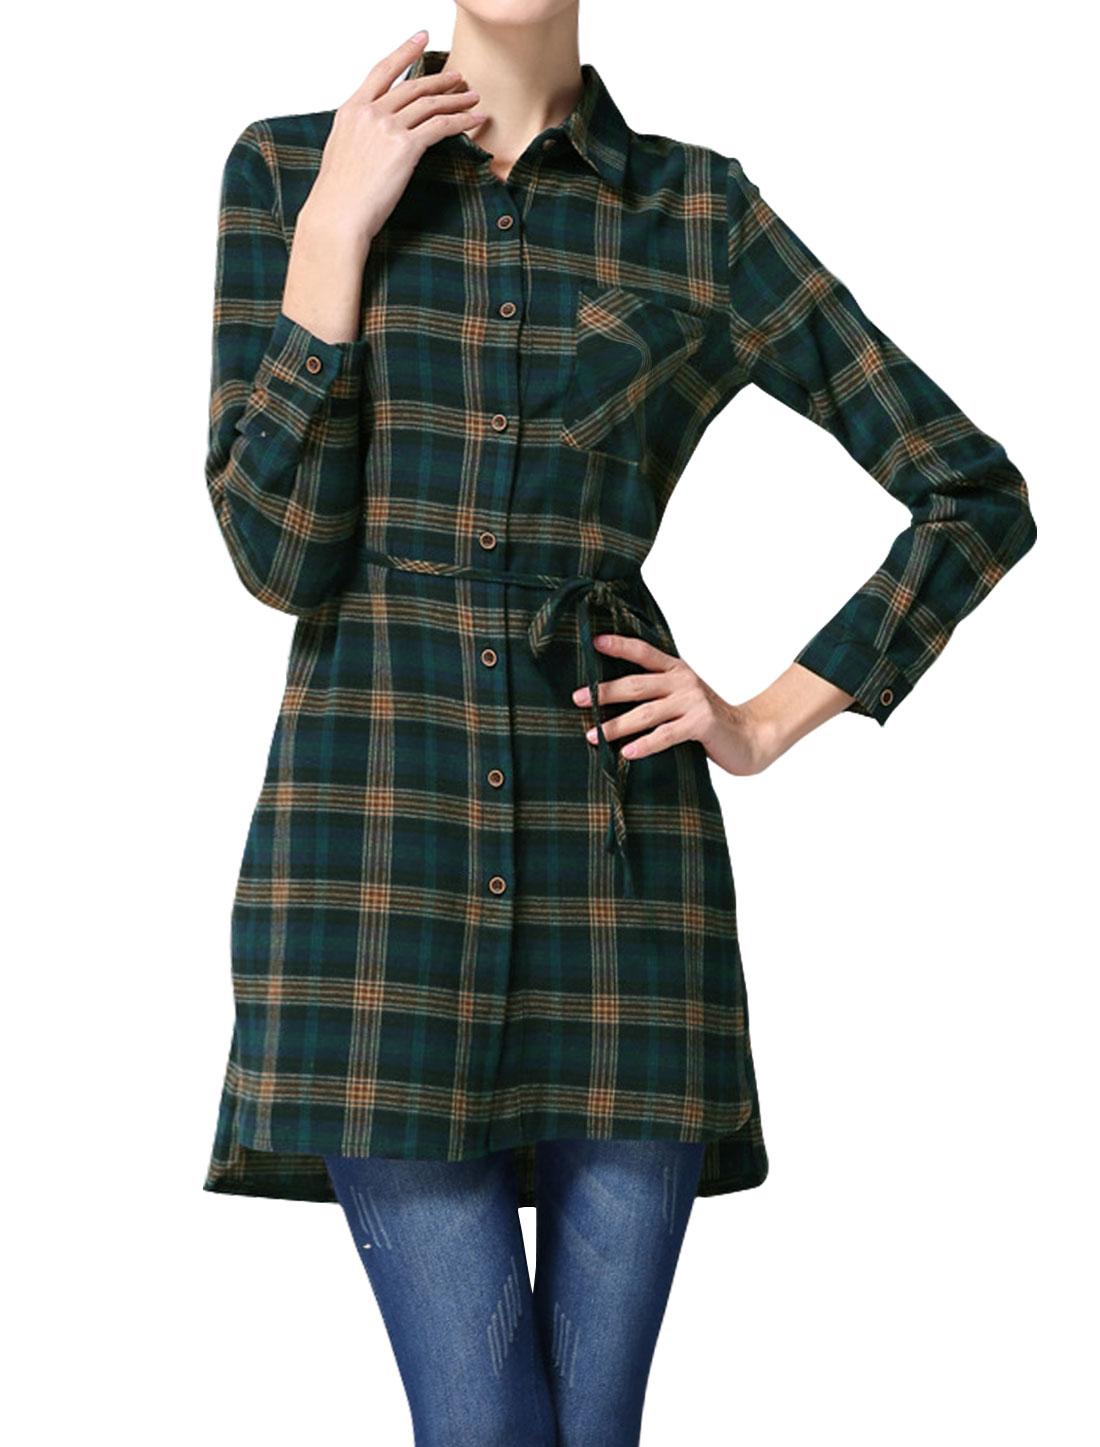 Women One Pocket Slim Fit Plaids Tunic Shirt w Waist String Green S